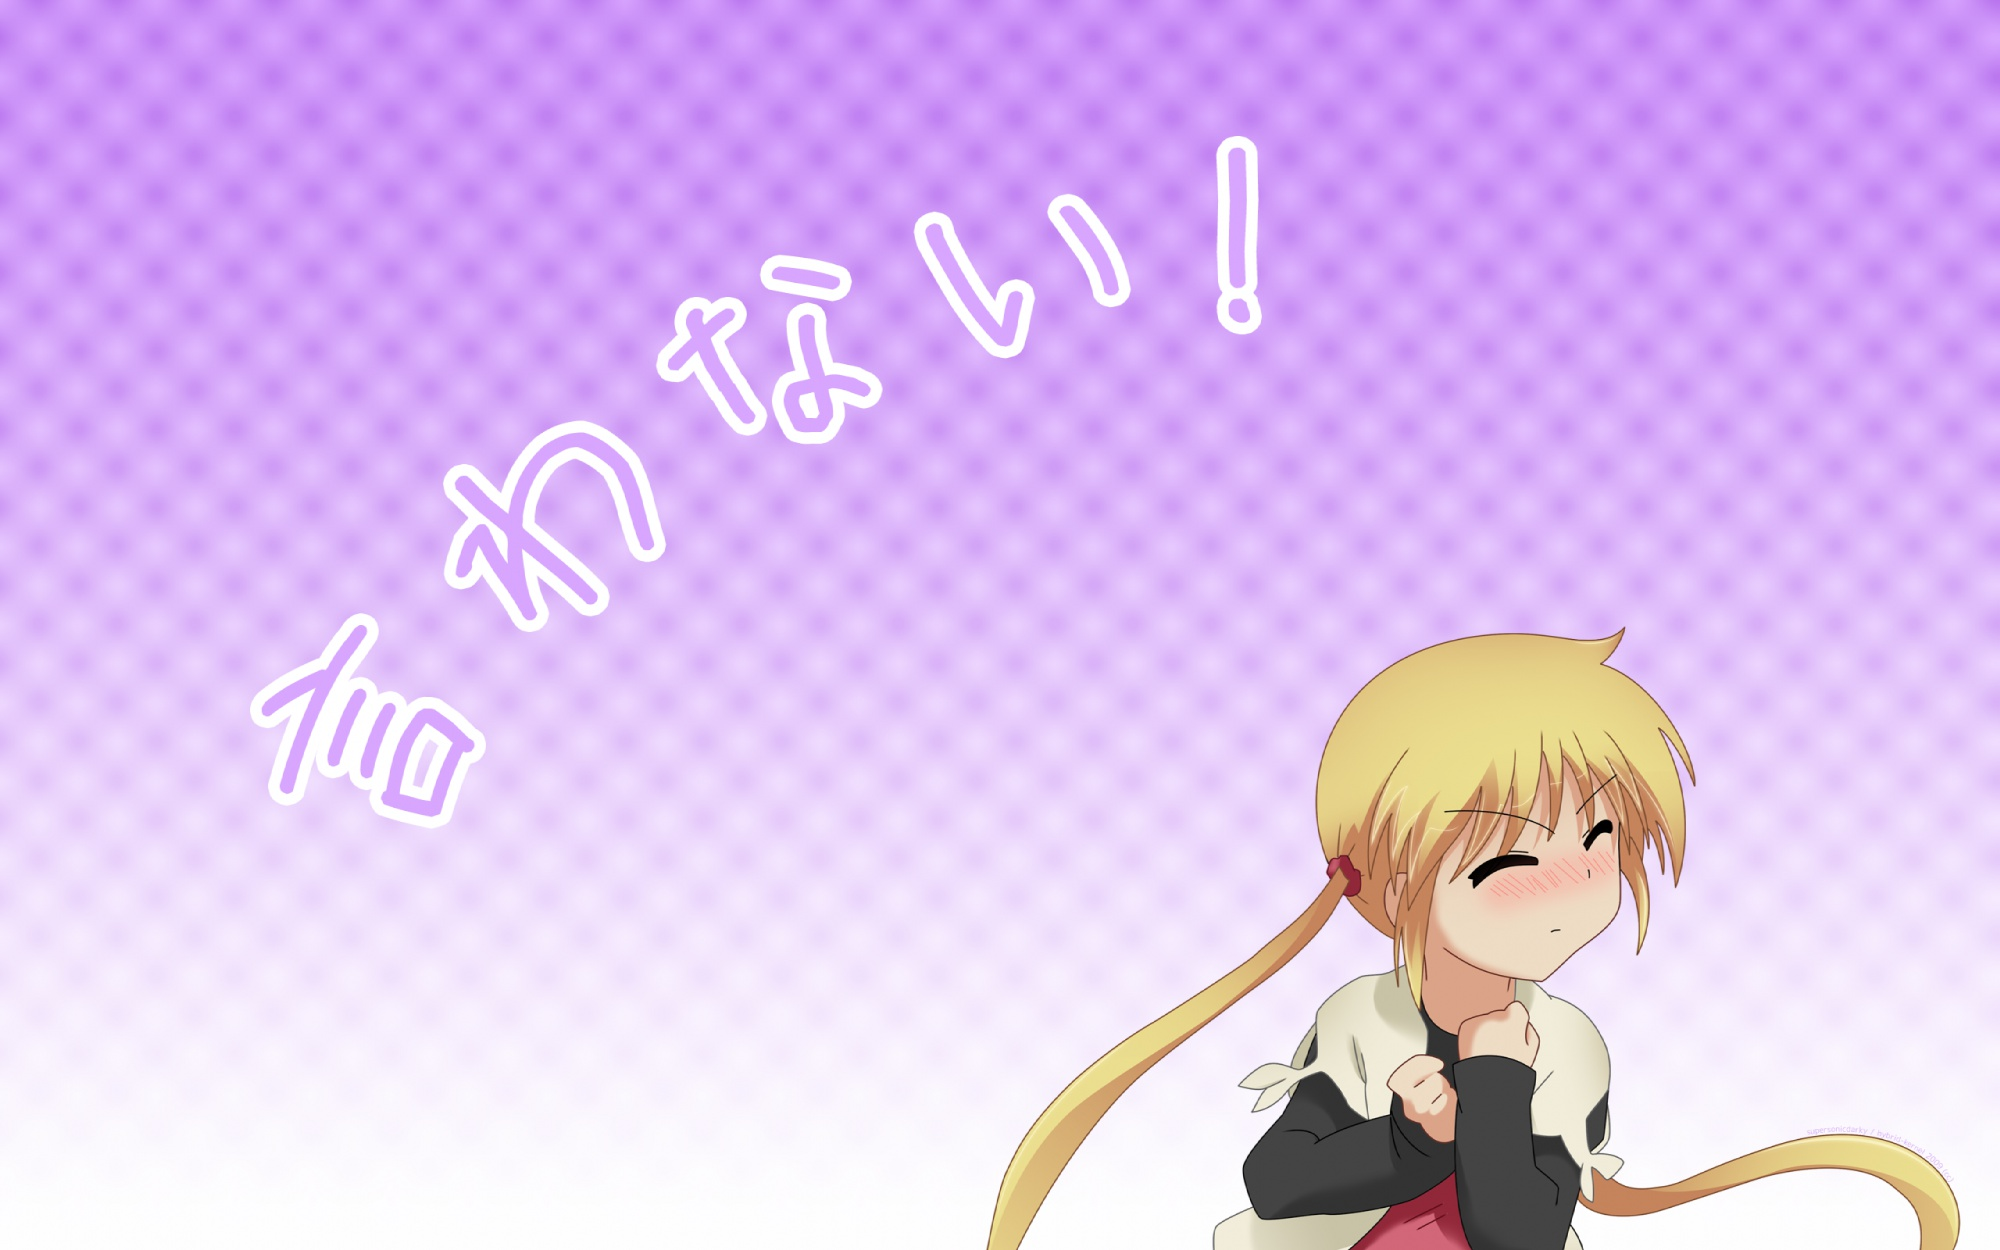 hayate_no_gotoku sanzenin_nagi supersonicdarky twintails